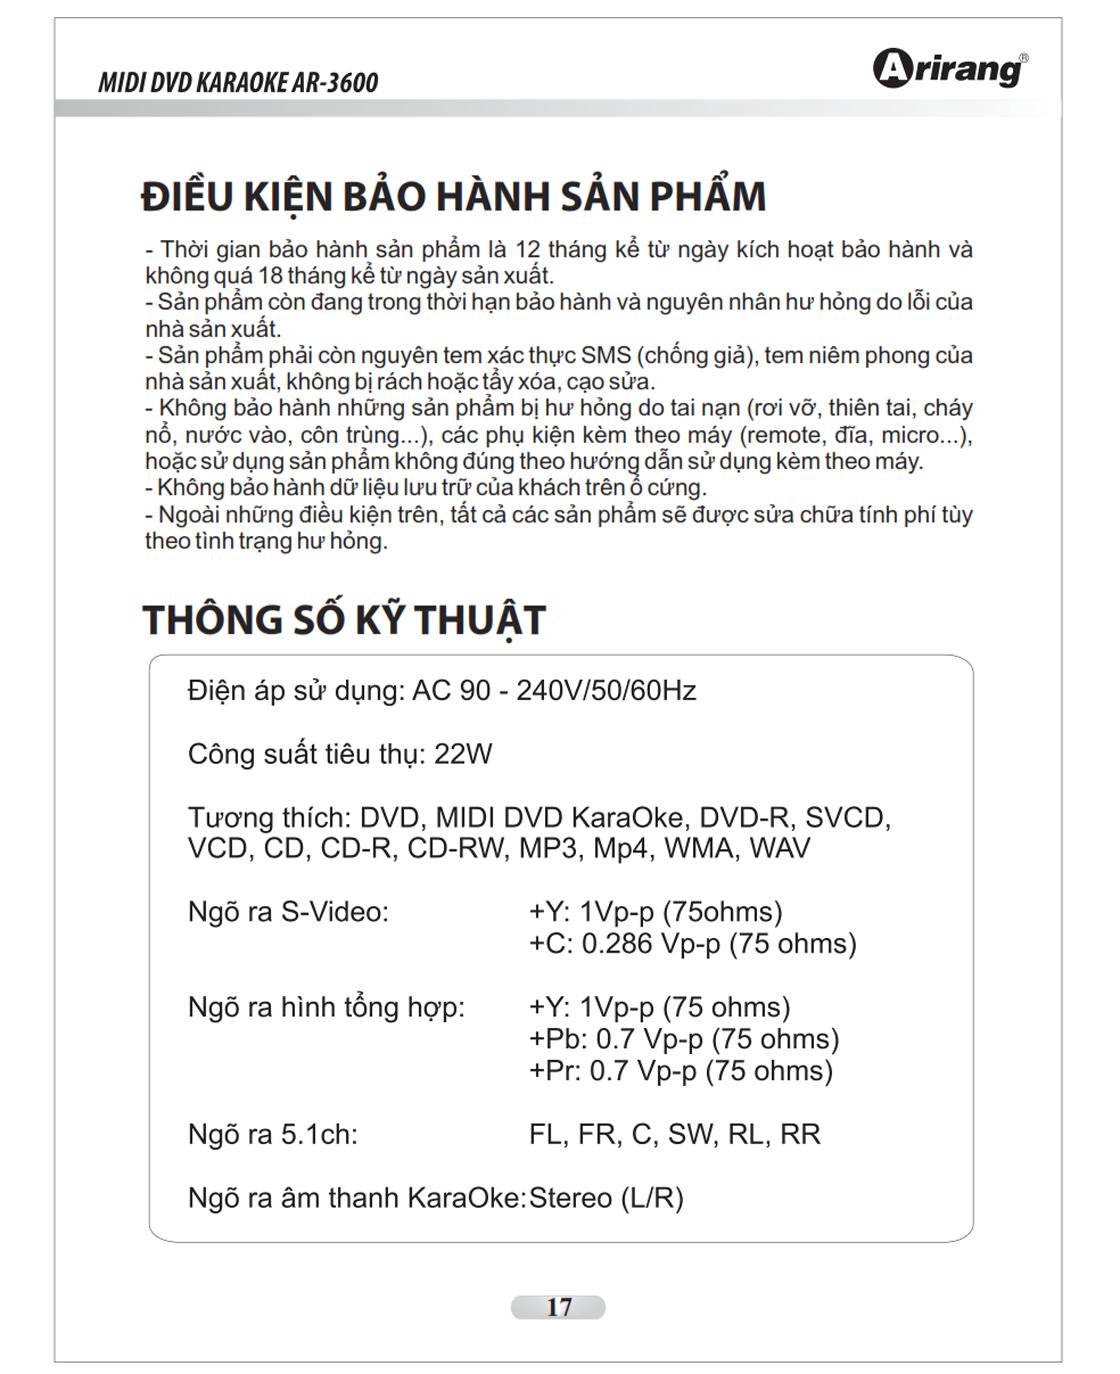 huong-dan-su-dung-amply-karaoke-arirang-AR-3600-vn_018.png